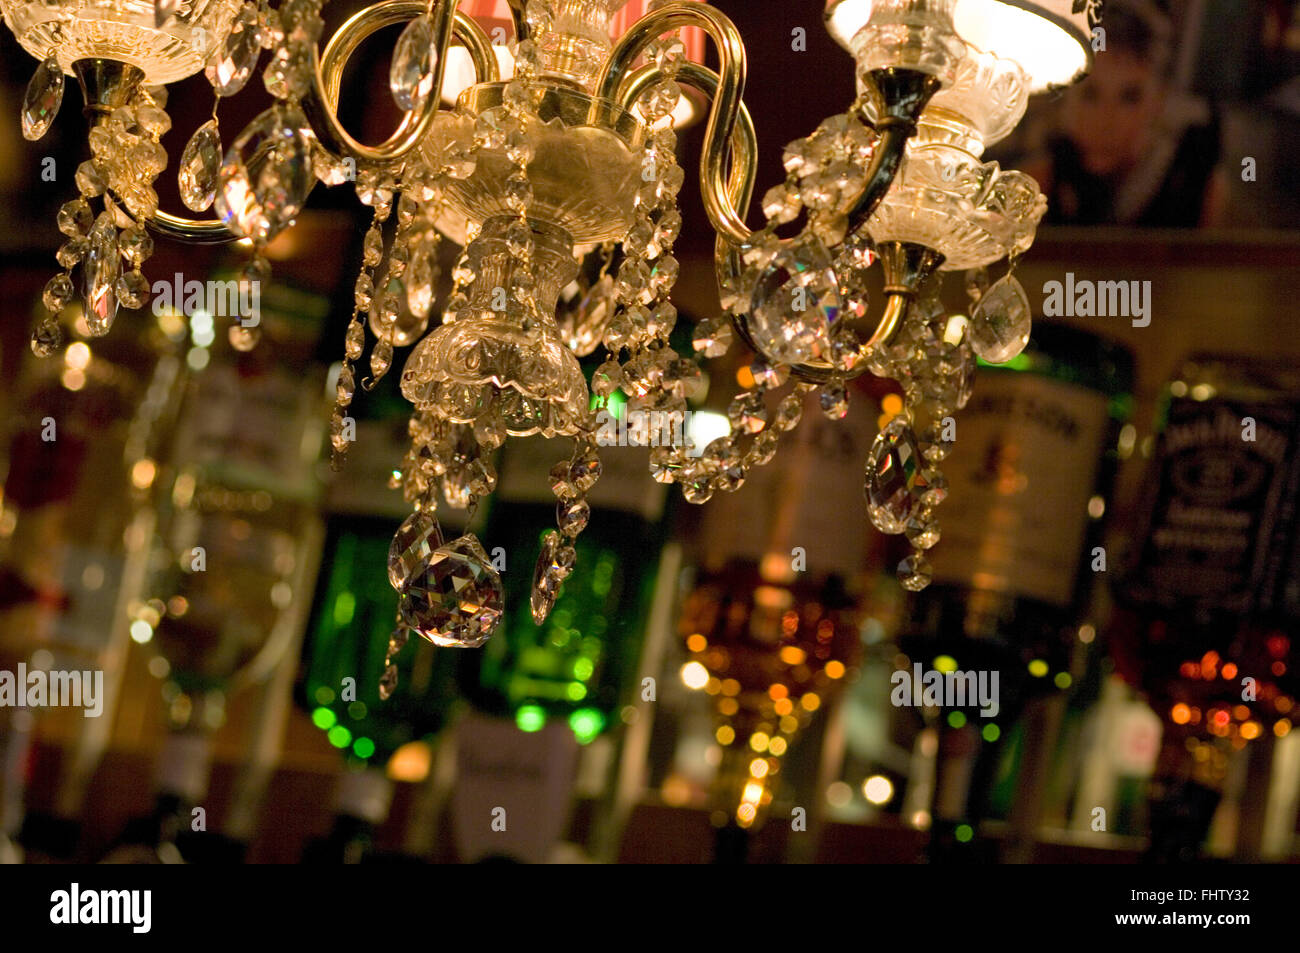 Lampadari con bottiglie lampadario a cascata lampadario a cascata